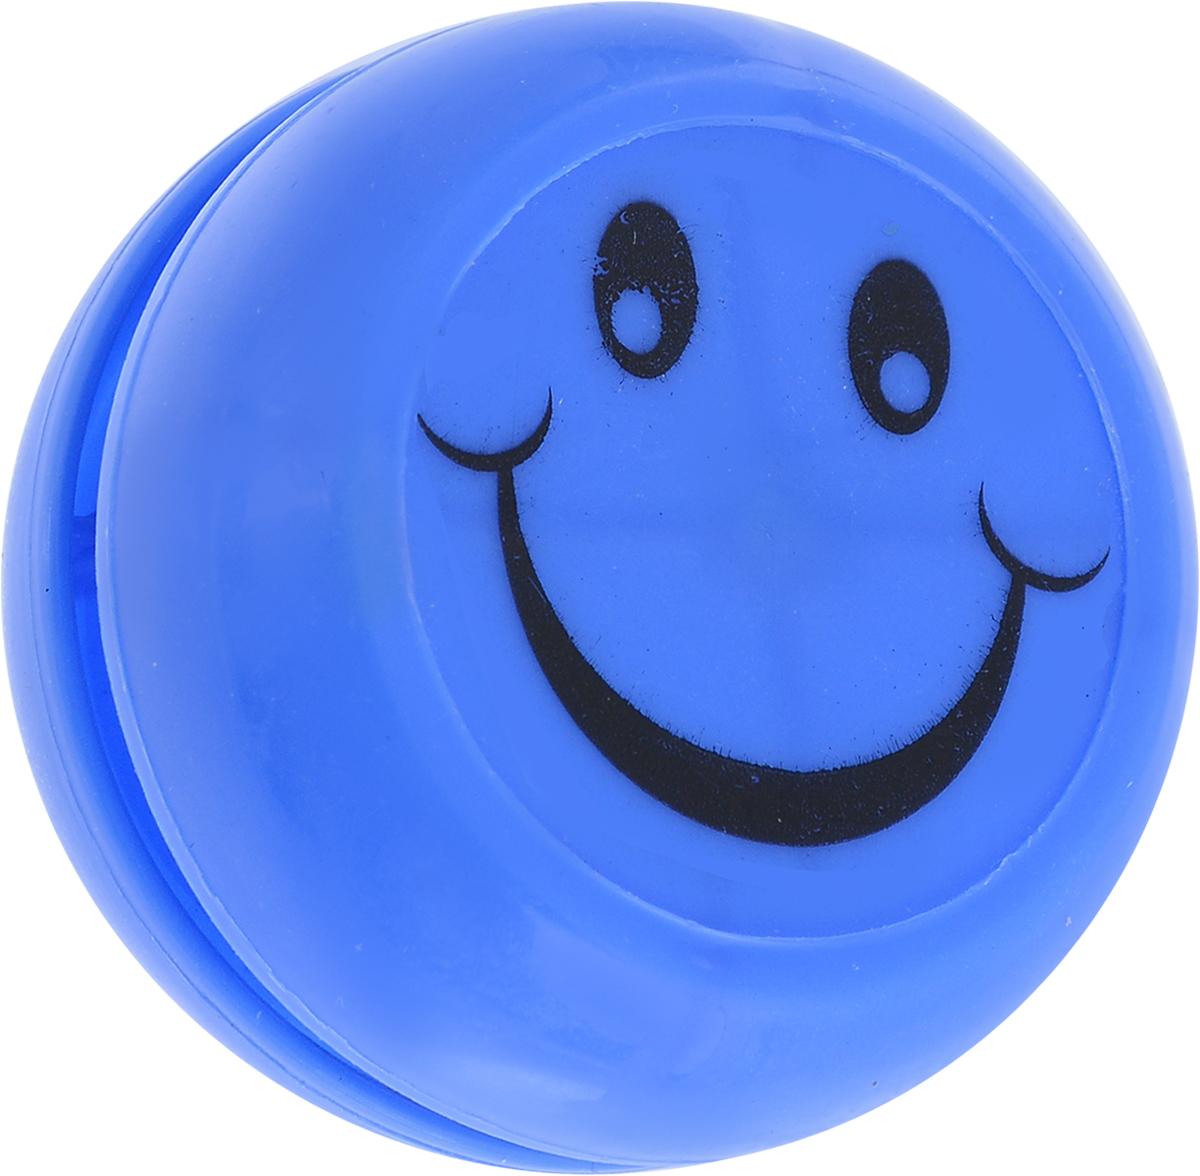 Sima-land Йо-йо Смайл цвет синий